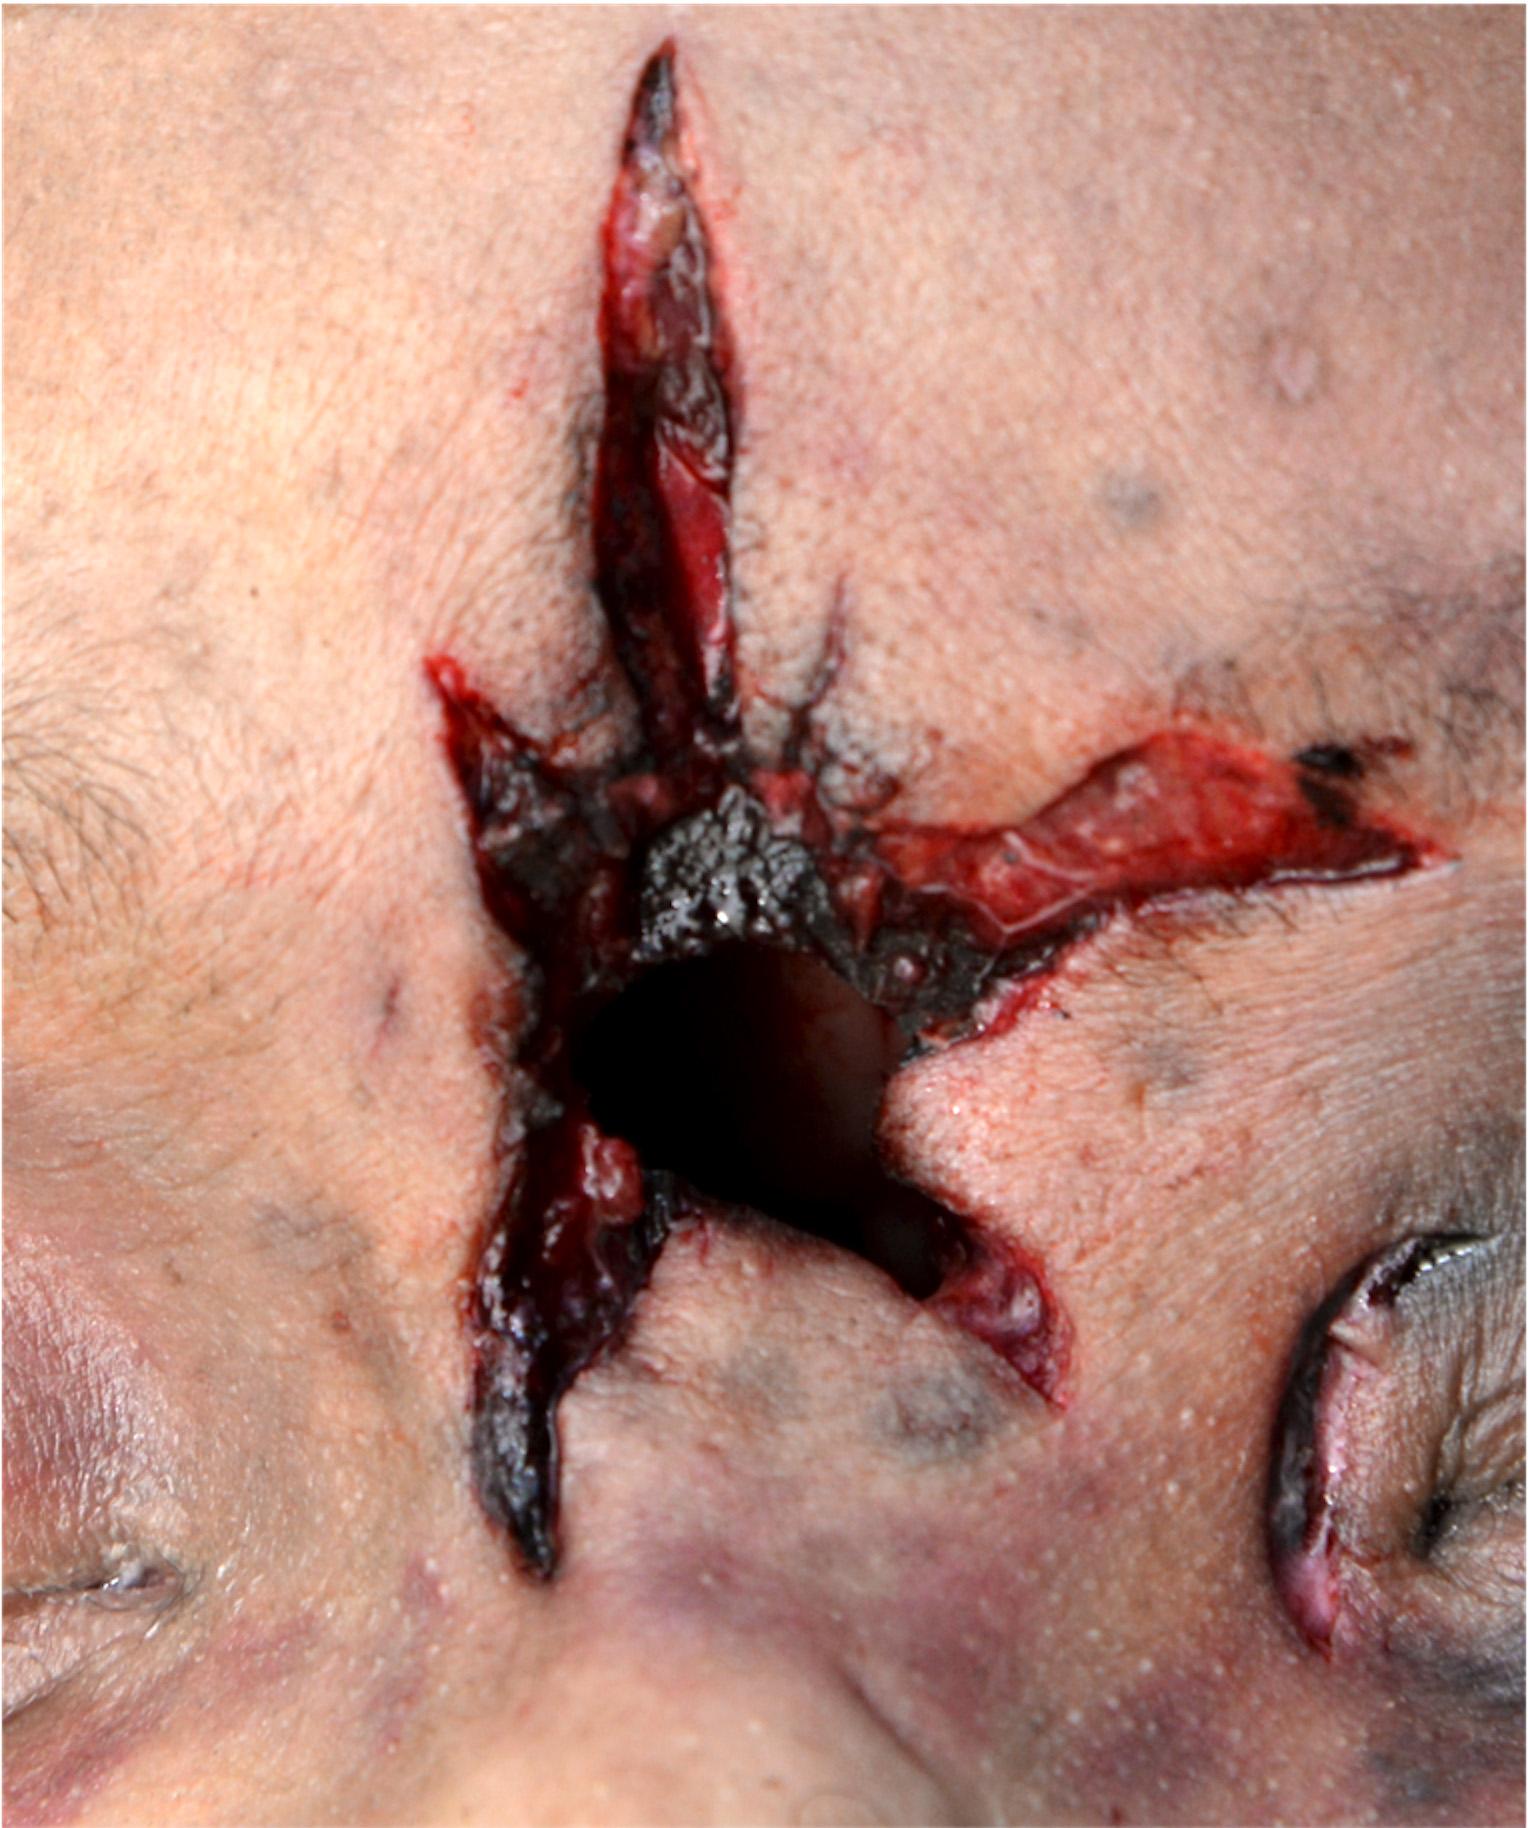 Hard contact entrance gunshot wound